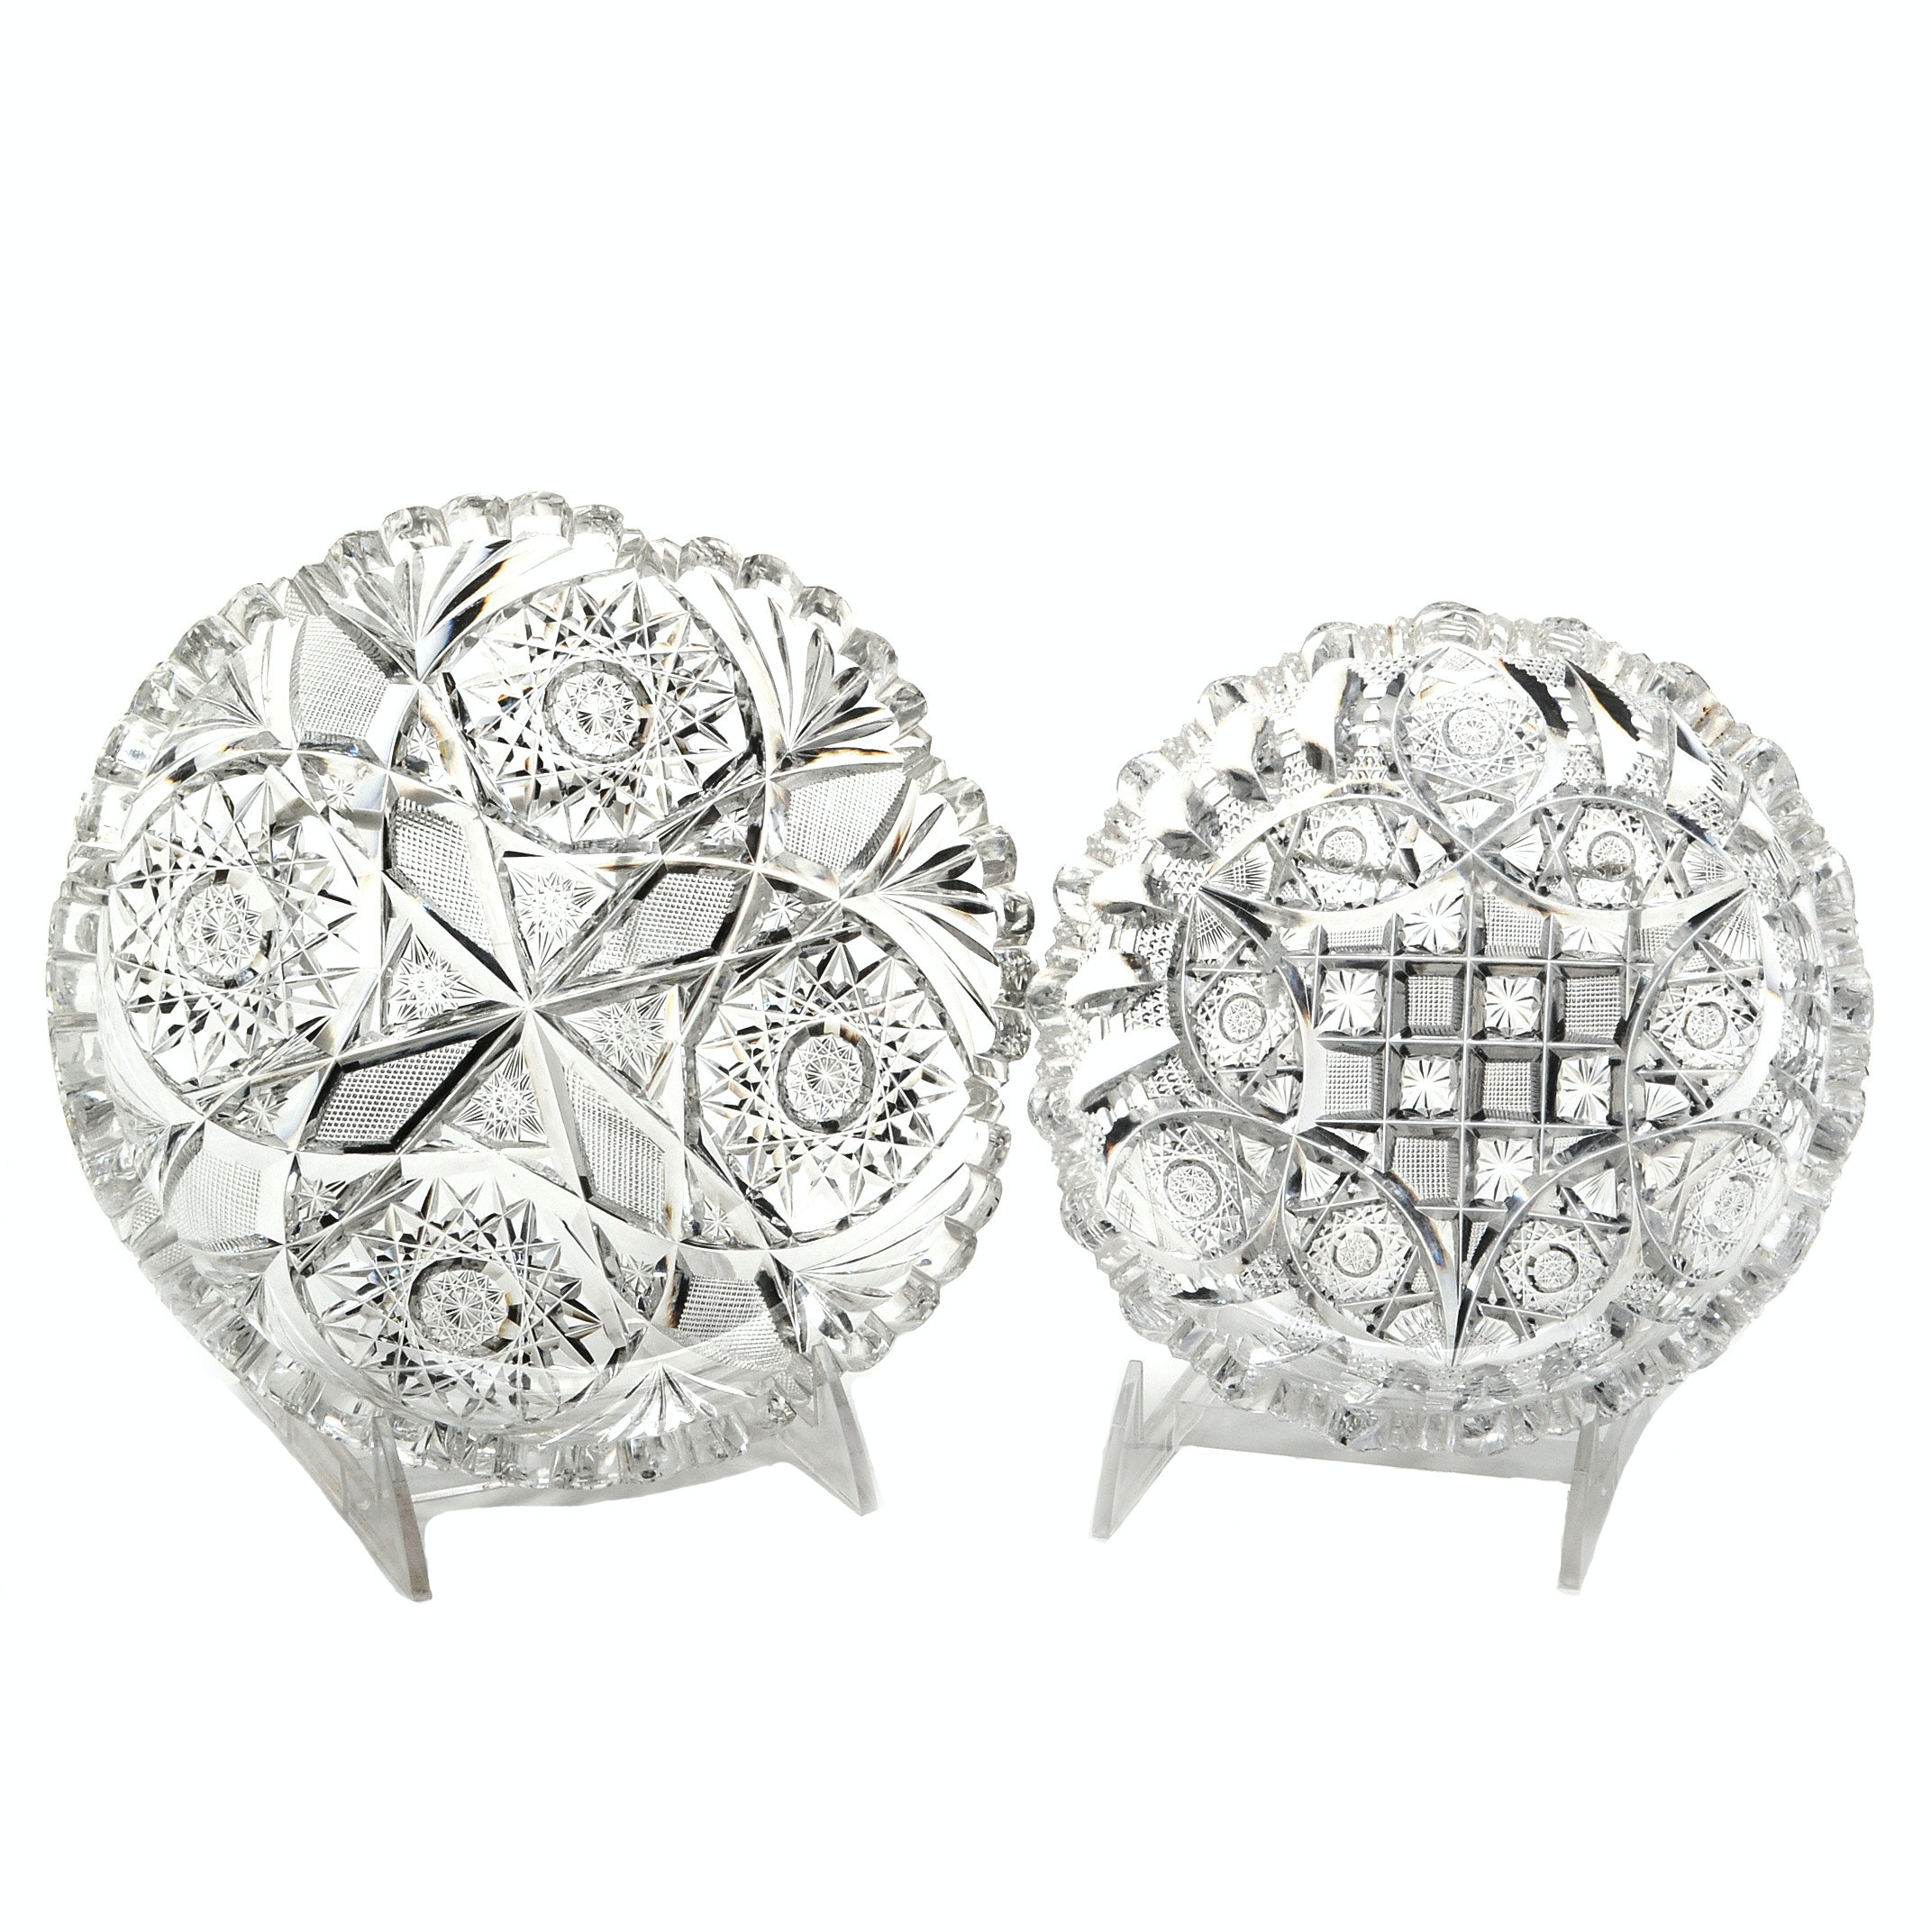 Two American Brilliant Period Cut Glass Libbey Bon-Bon Dishes